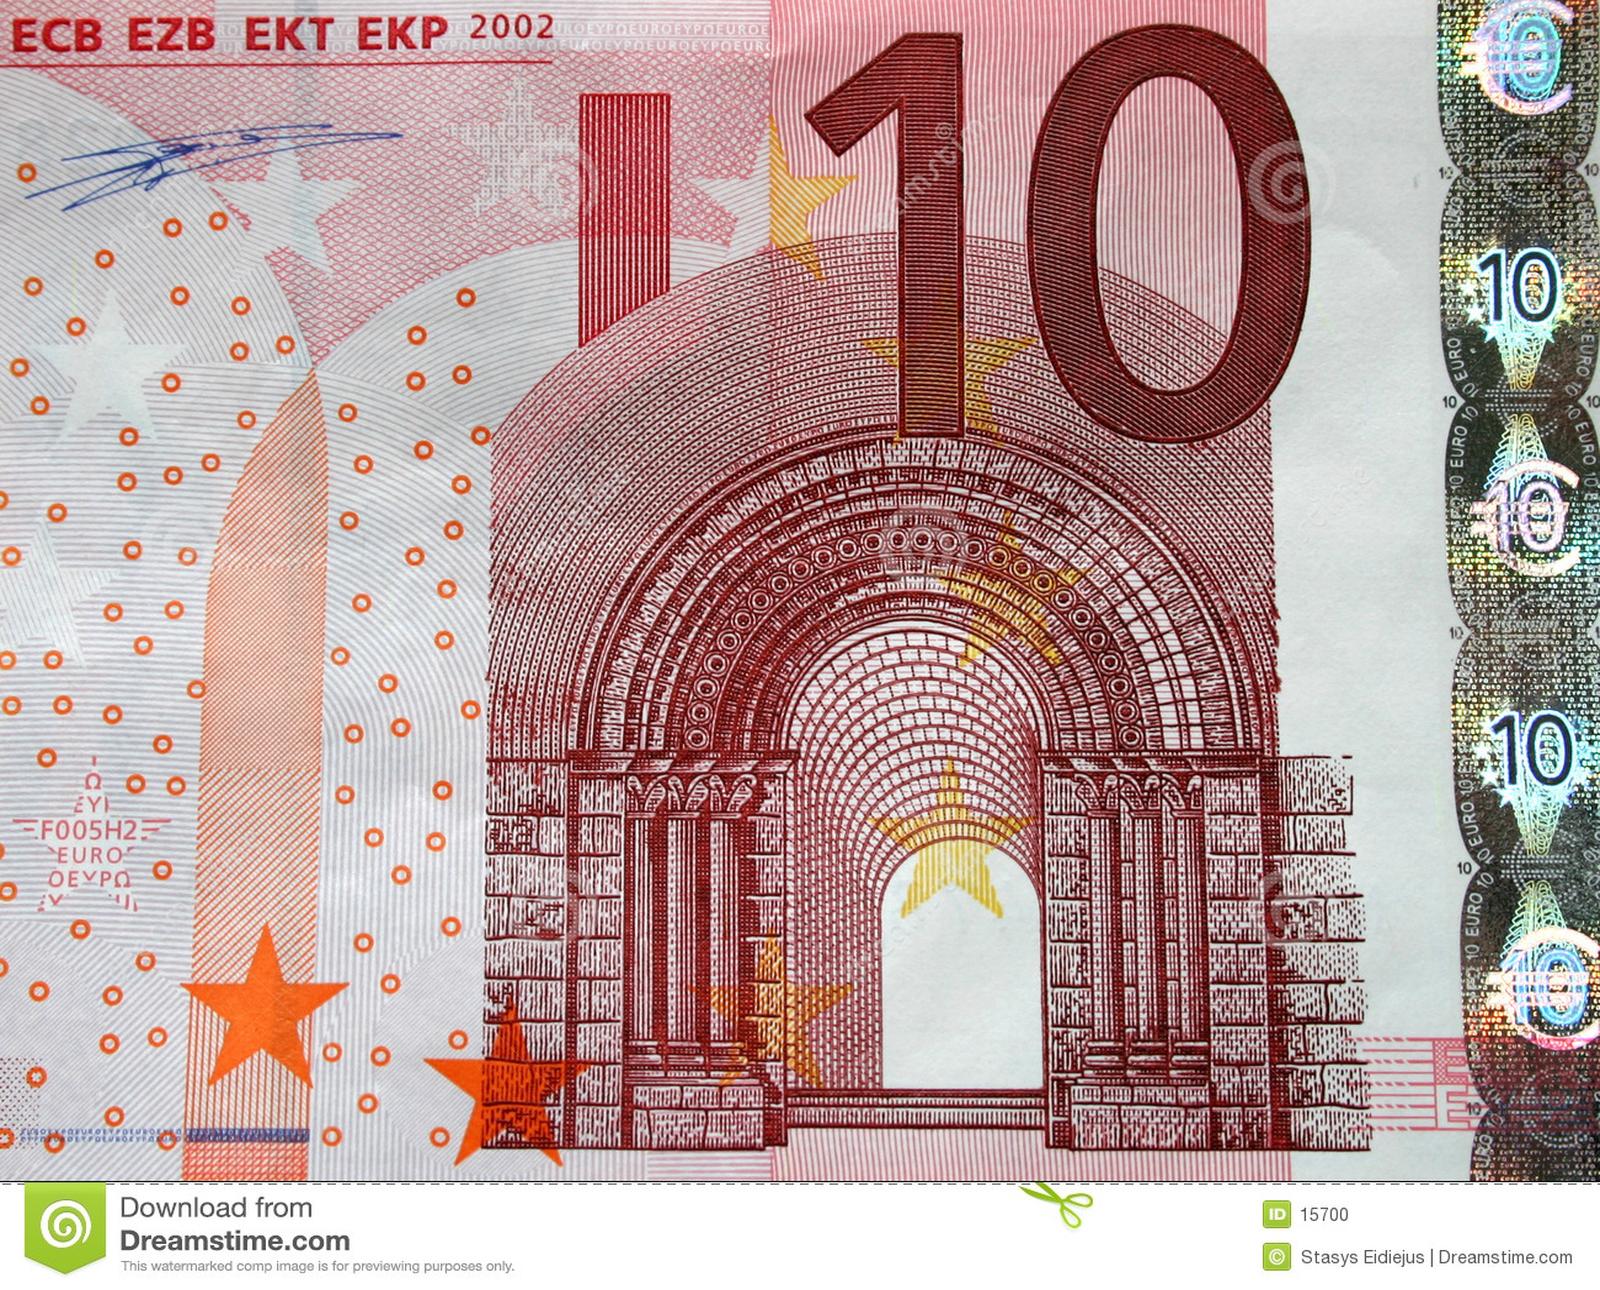 10 Euros bill close-up, detail